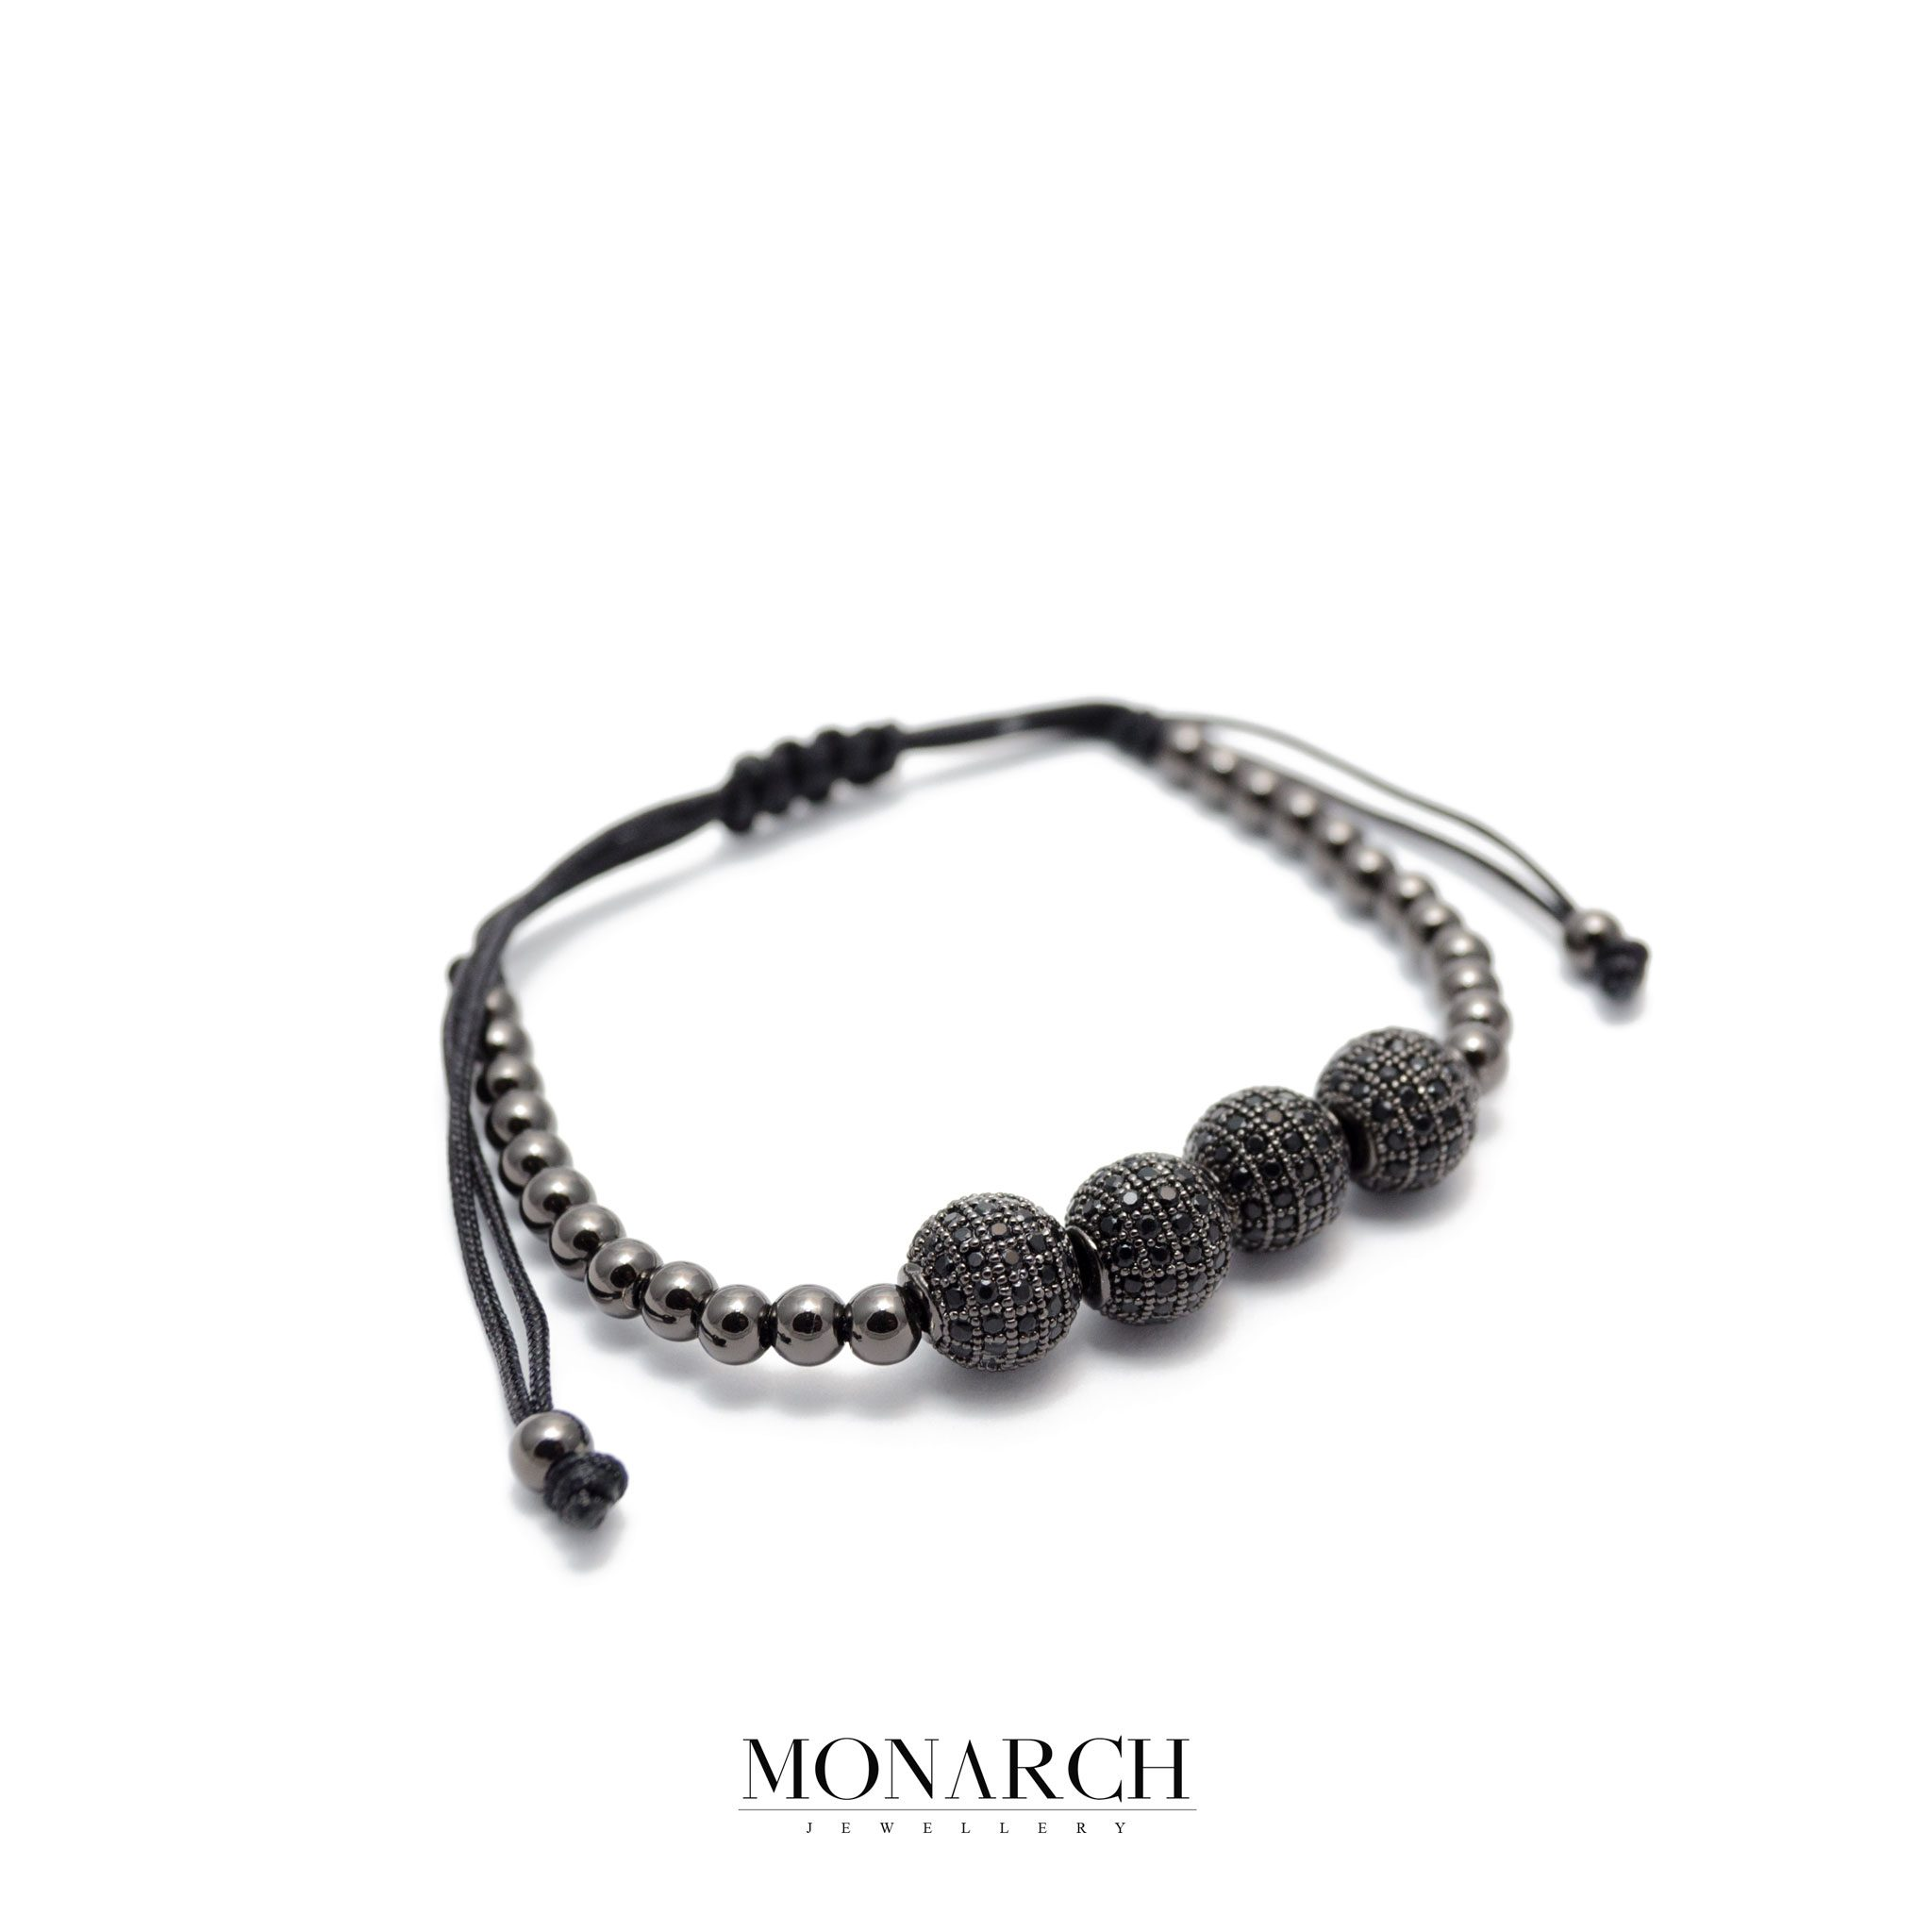 Monarch Jewellery Black Zircon Bead Luxury Macrame Bracelet